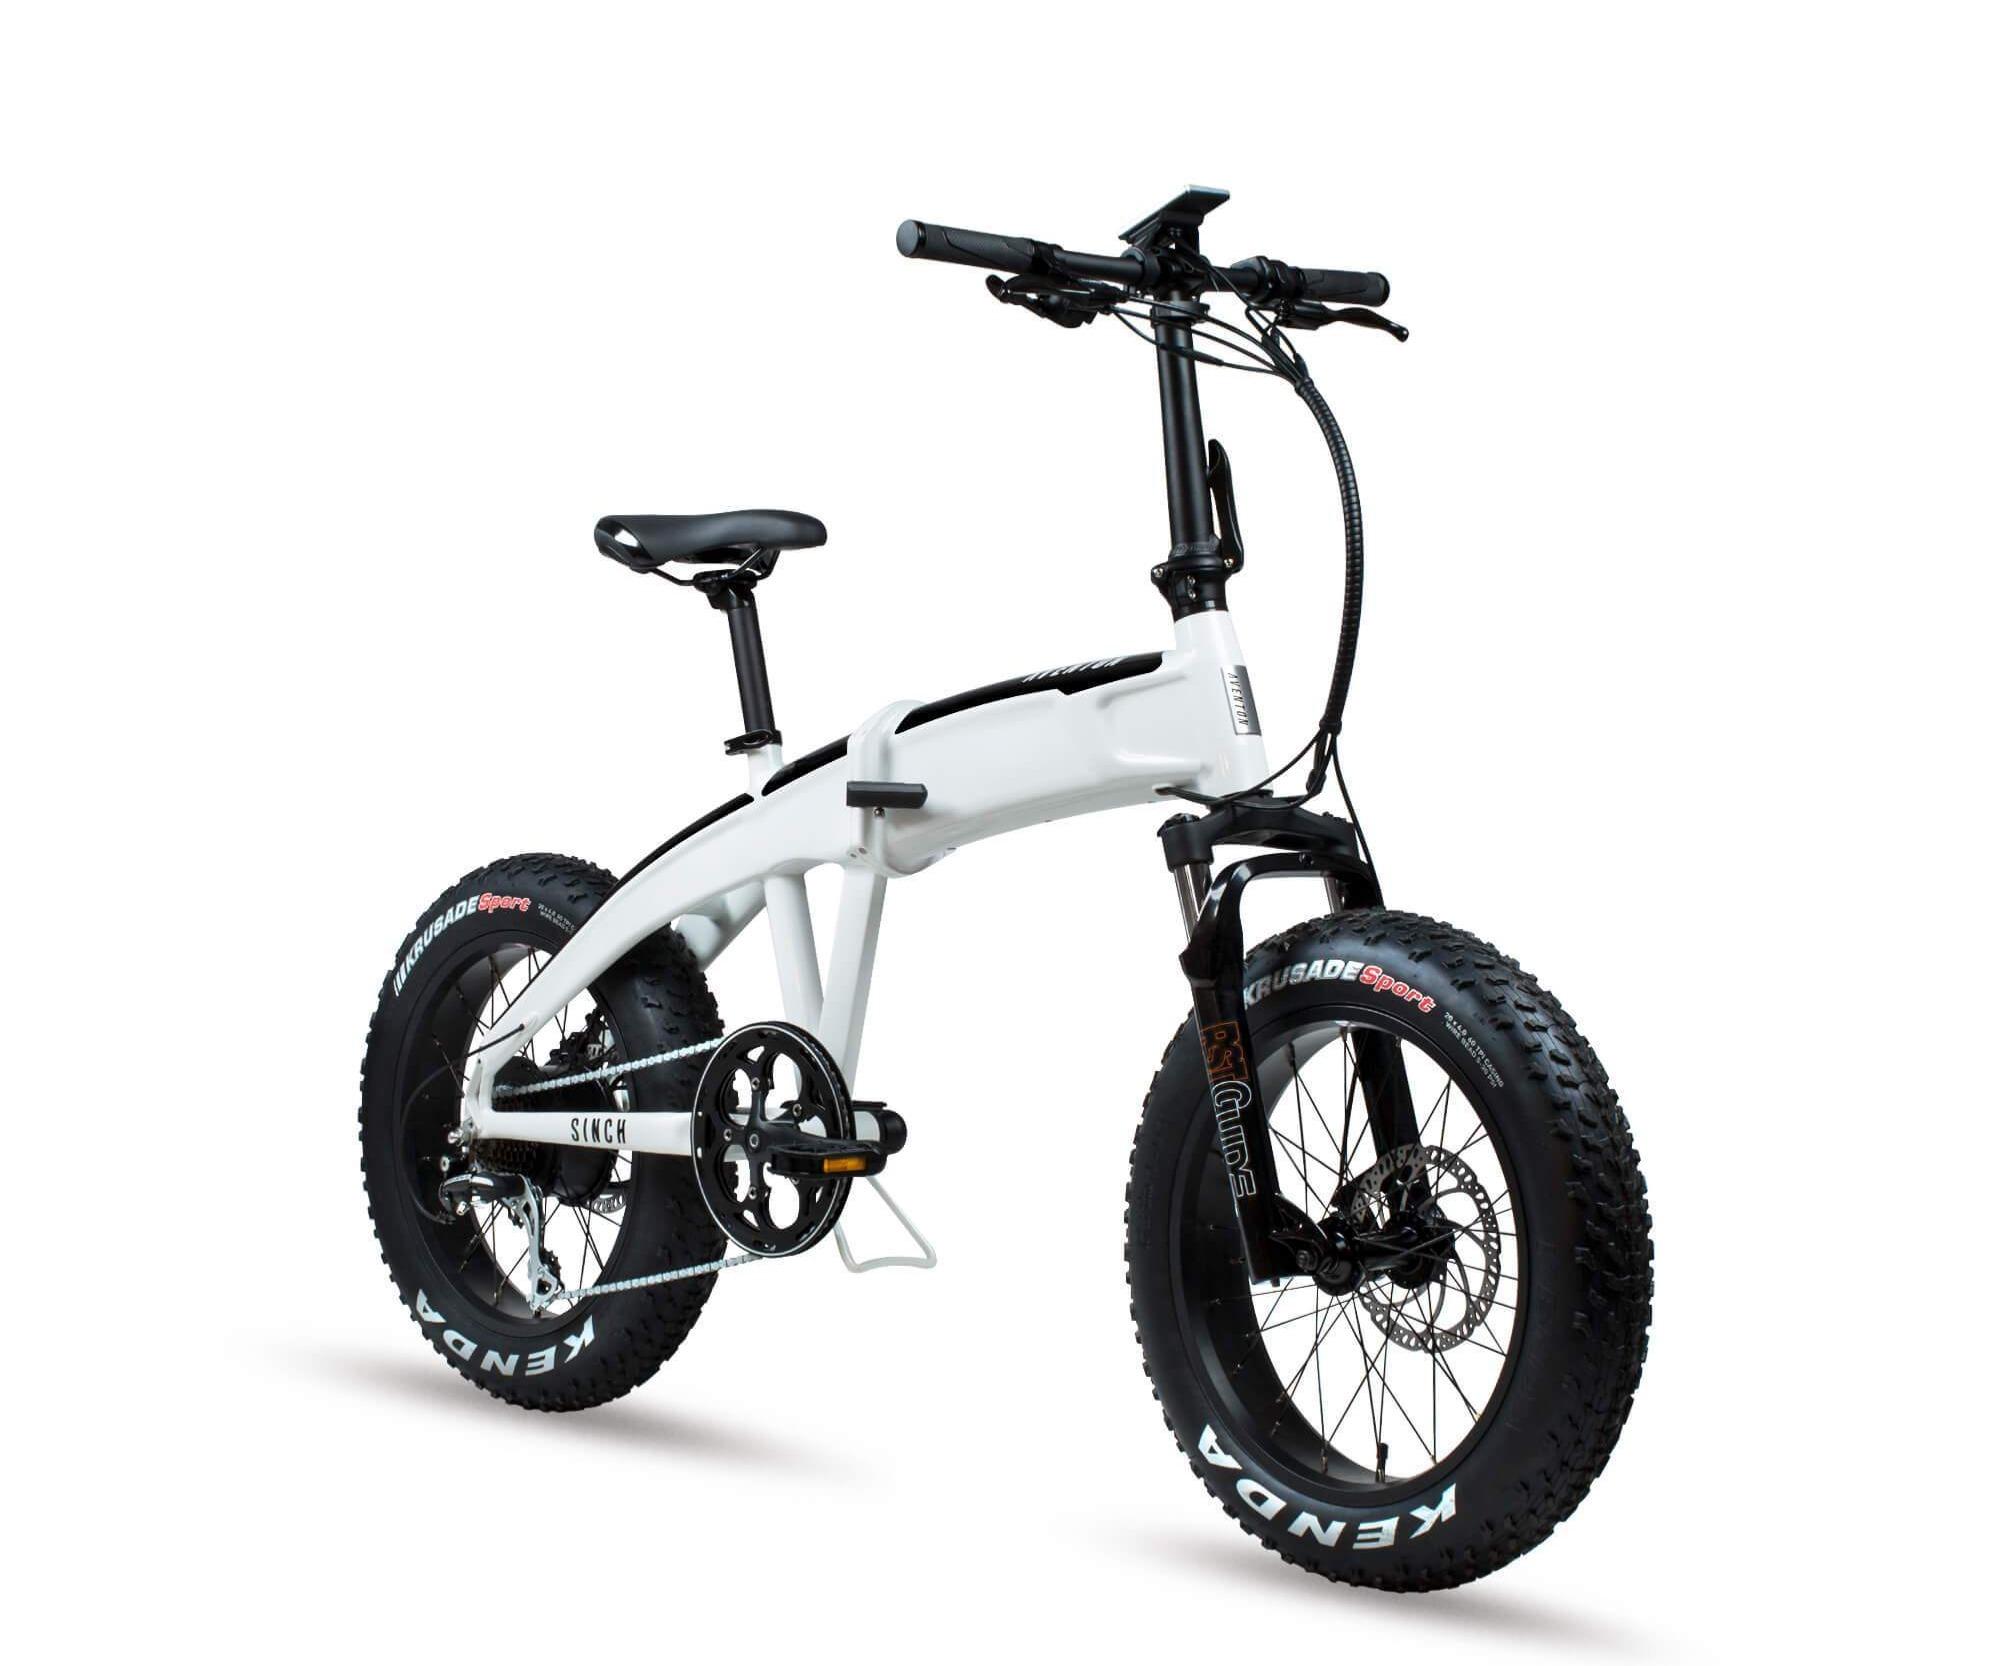 Aventon Electric Bikes Sinch model. A folding bicycle.